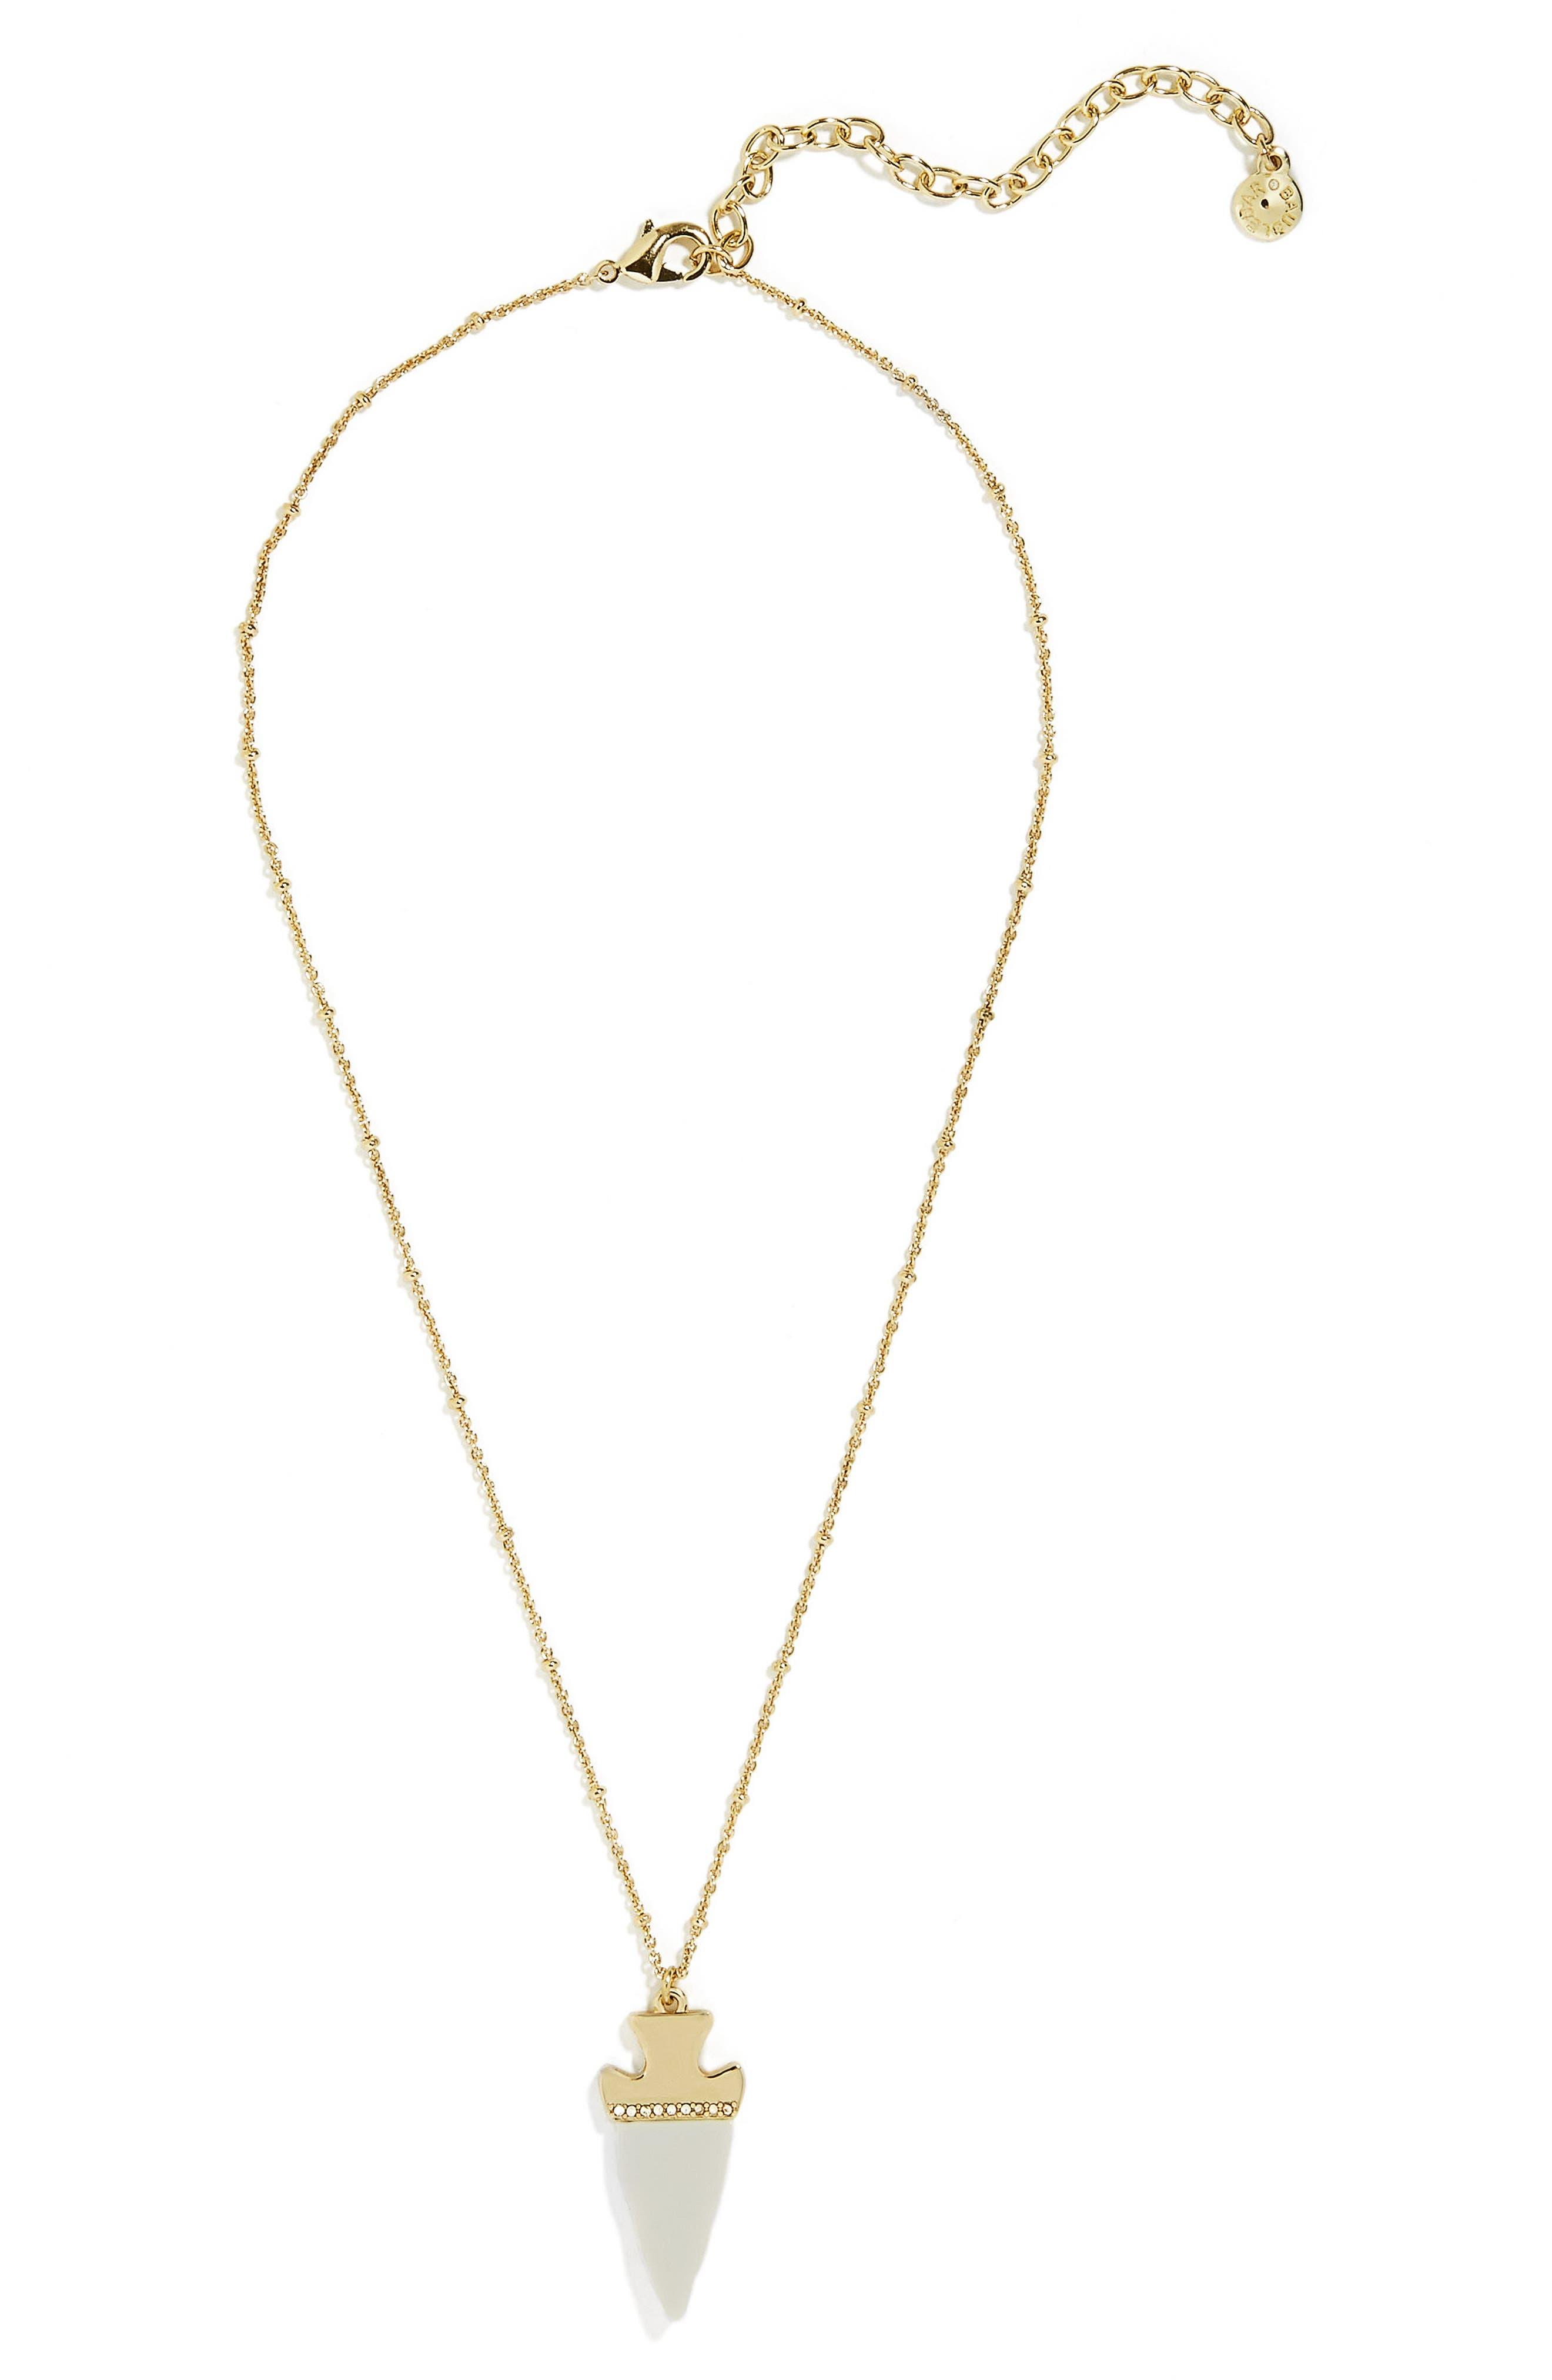 Main Image - Baublebar Pallas Pendant Necklace